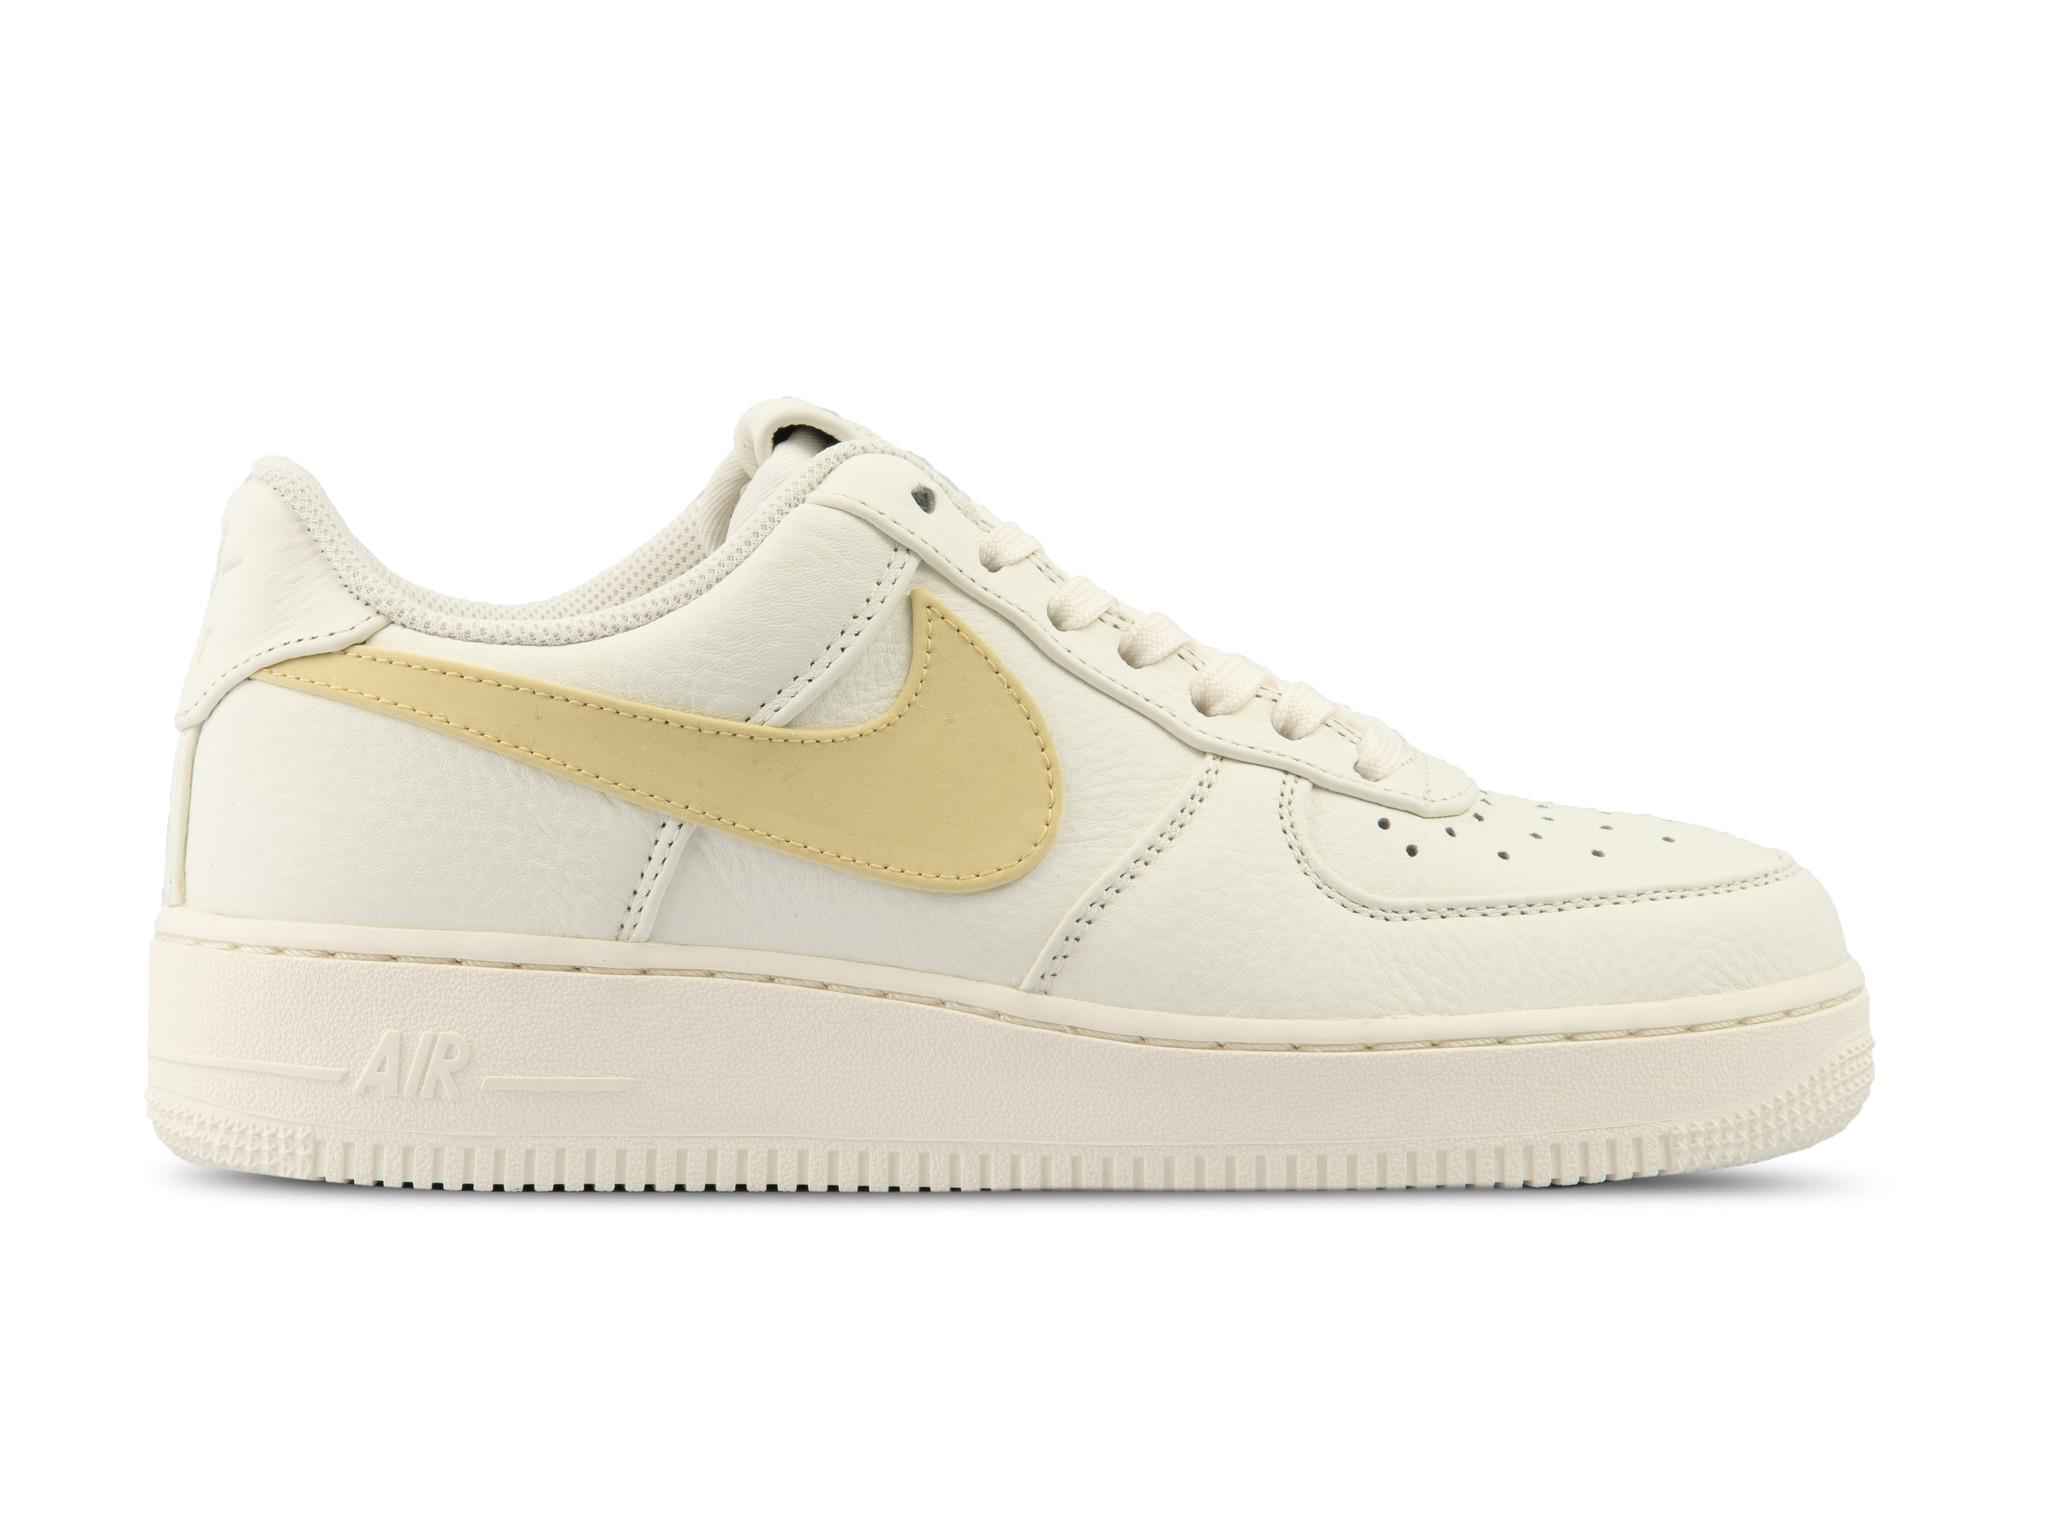 Nike Footwear Air Force 1 07 PRM 2 Sail Pale Vanilla